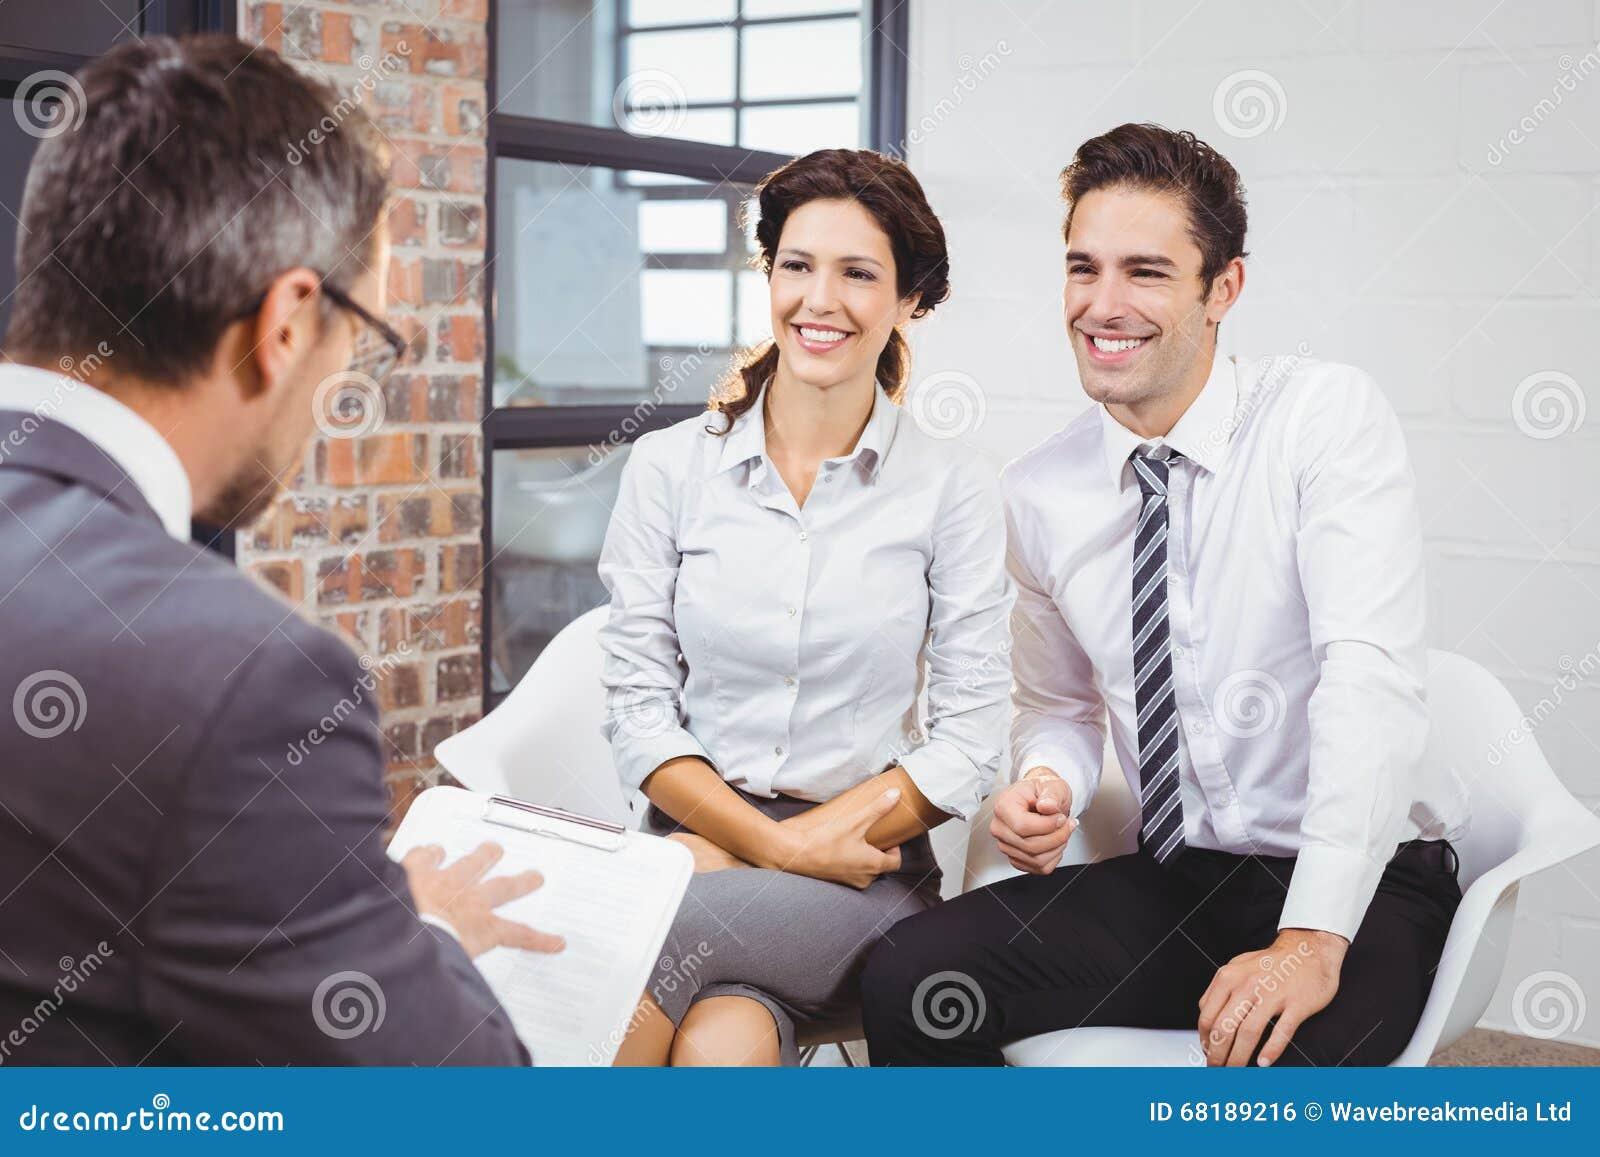 Glimlachende collega s die met bedrijfsberoeps bespreken